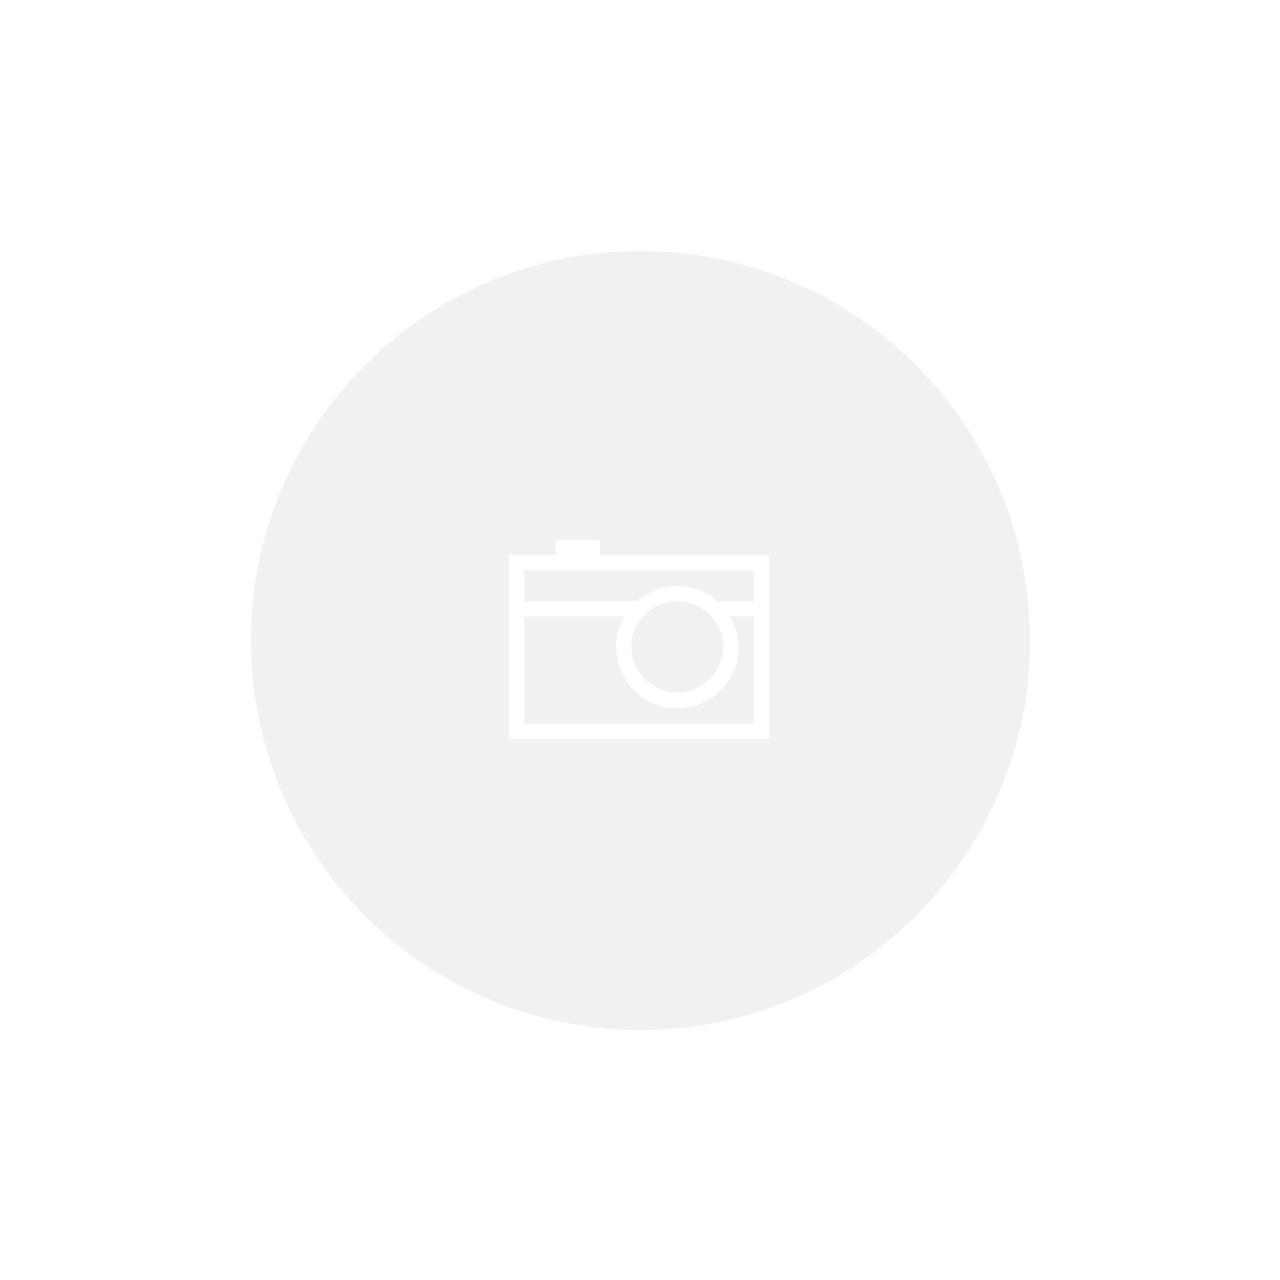 Conj. 8 pçs Licor Silver Marrocos Zamac 24,5X20,5cm